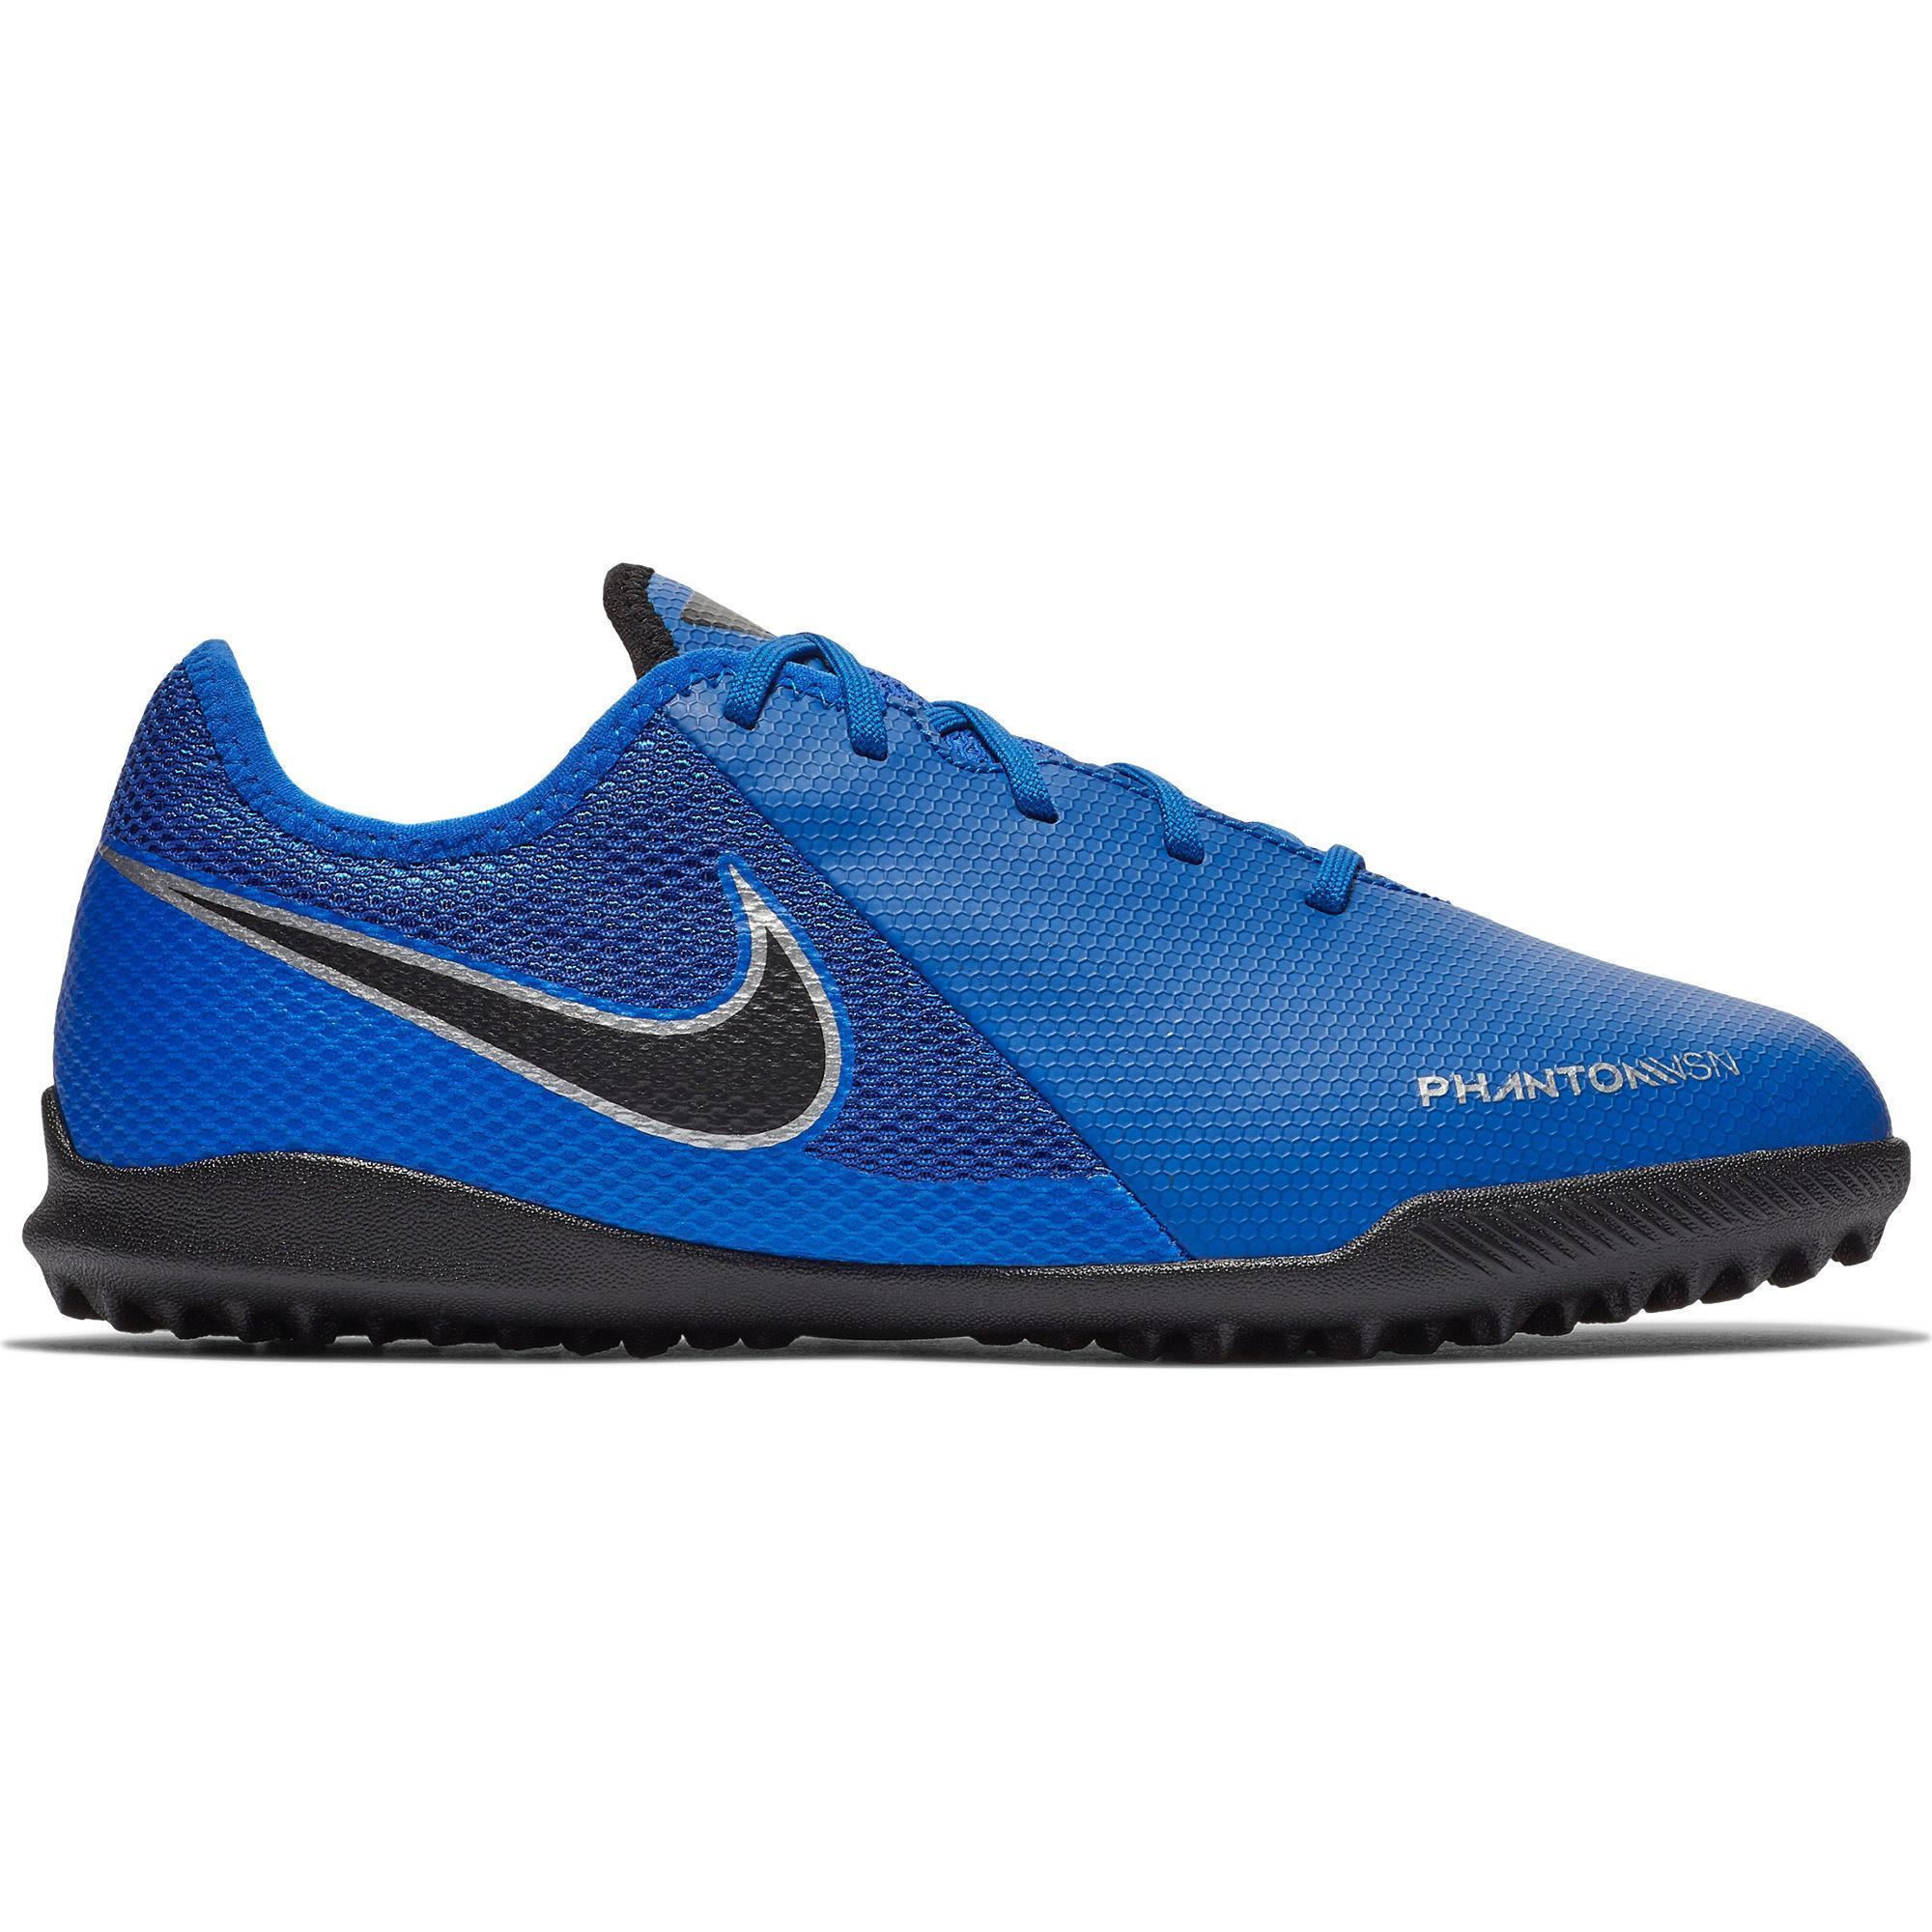 sale retailer fa3e7 93a69 Comprar Botas de Fútbol niños online   Decathlon